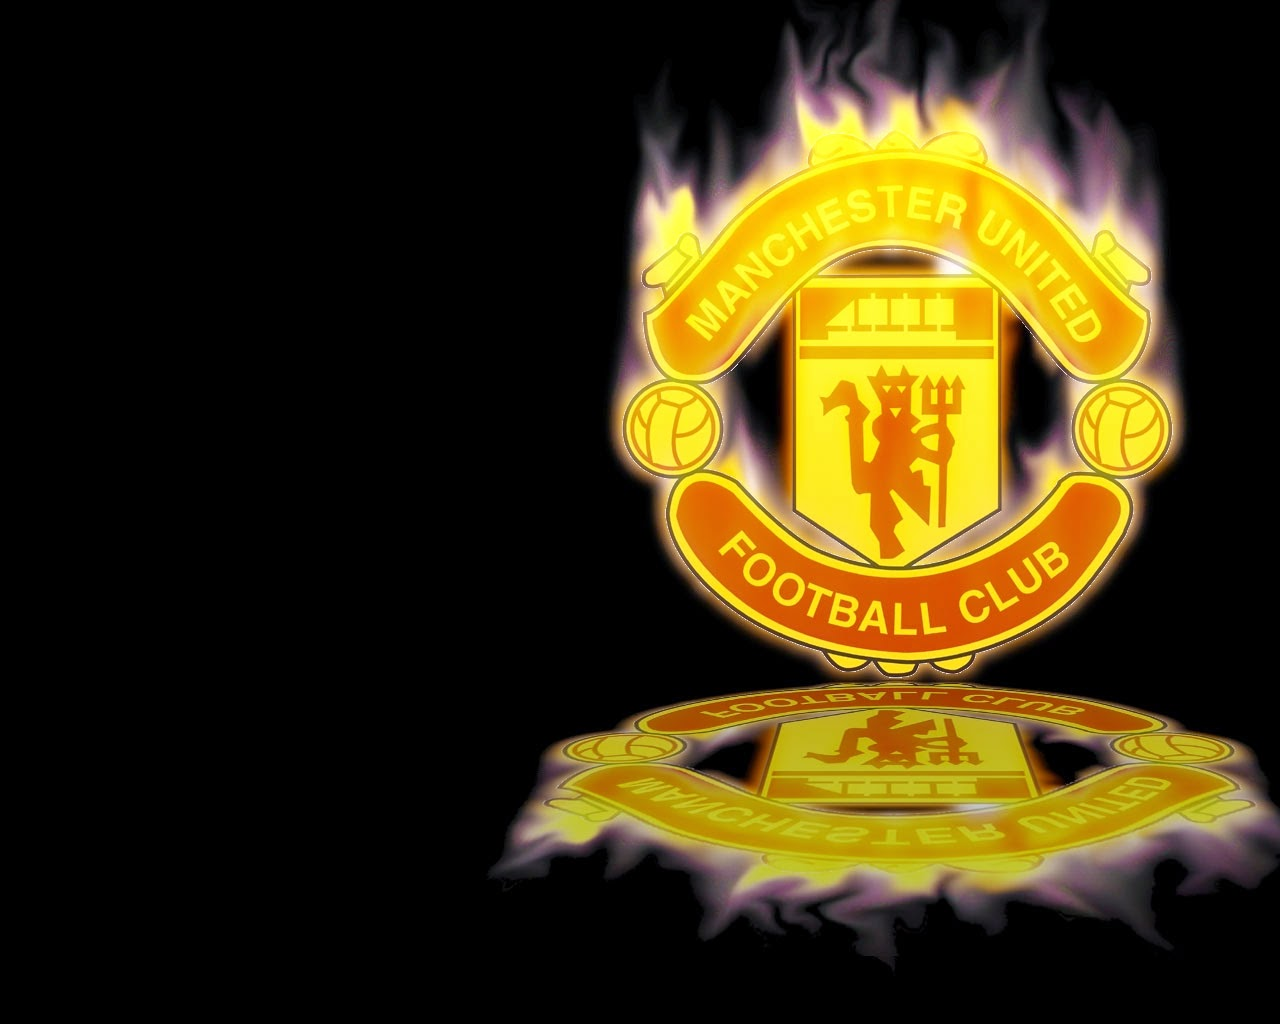 Manchester United Logo Wallpapers Hd Wallpaper 1280x1024